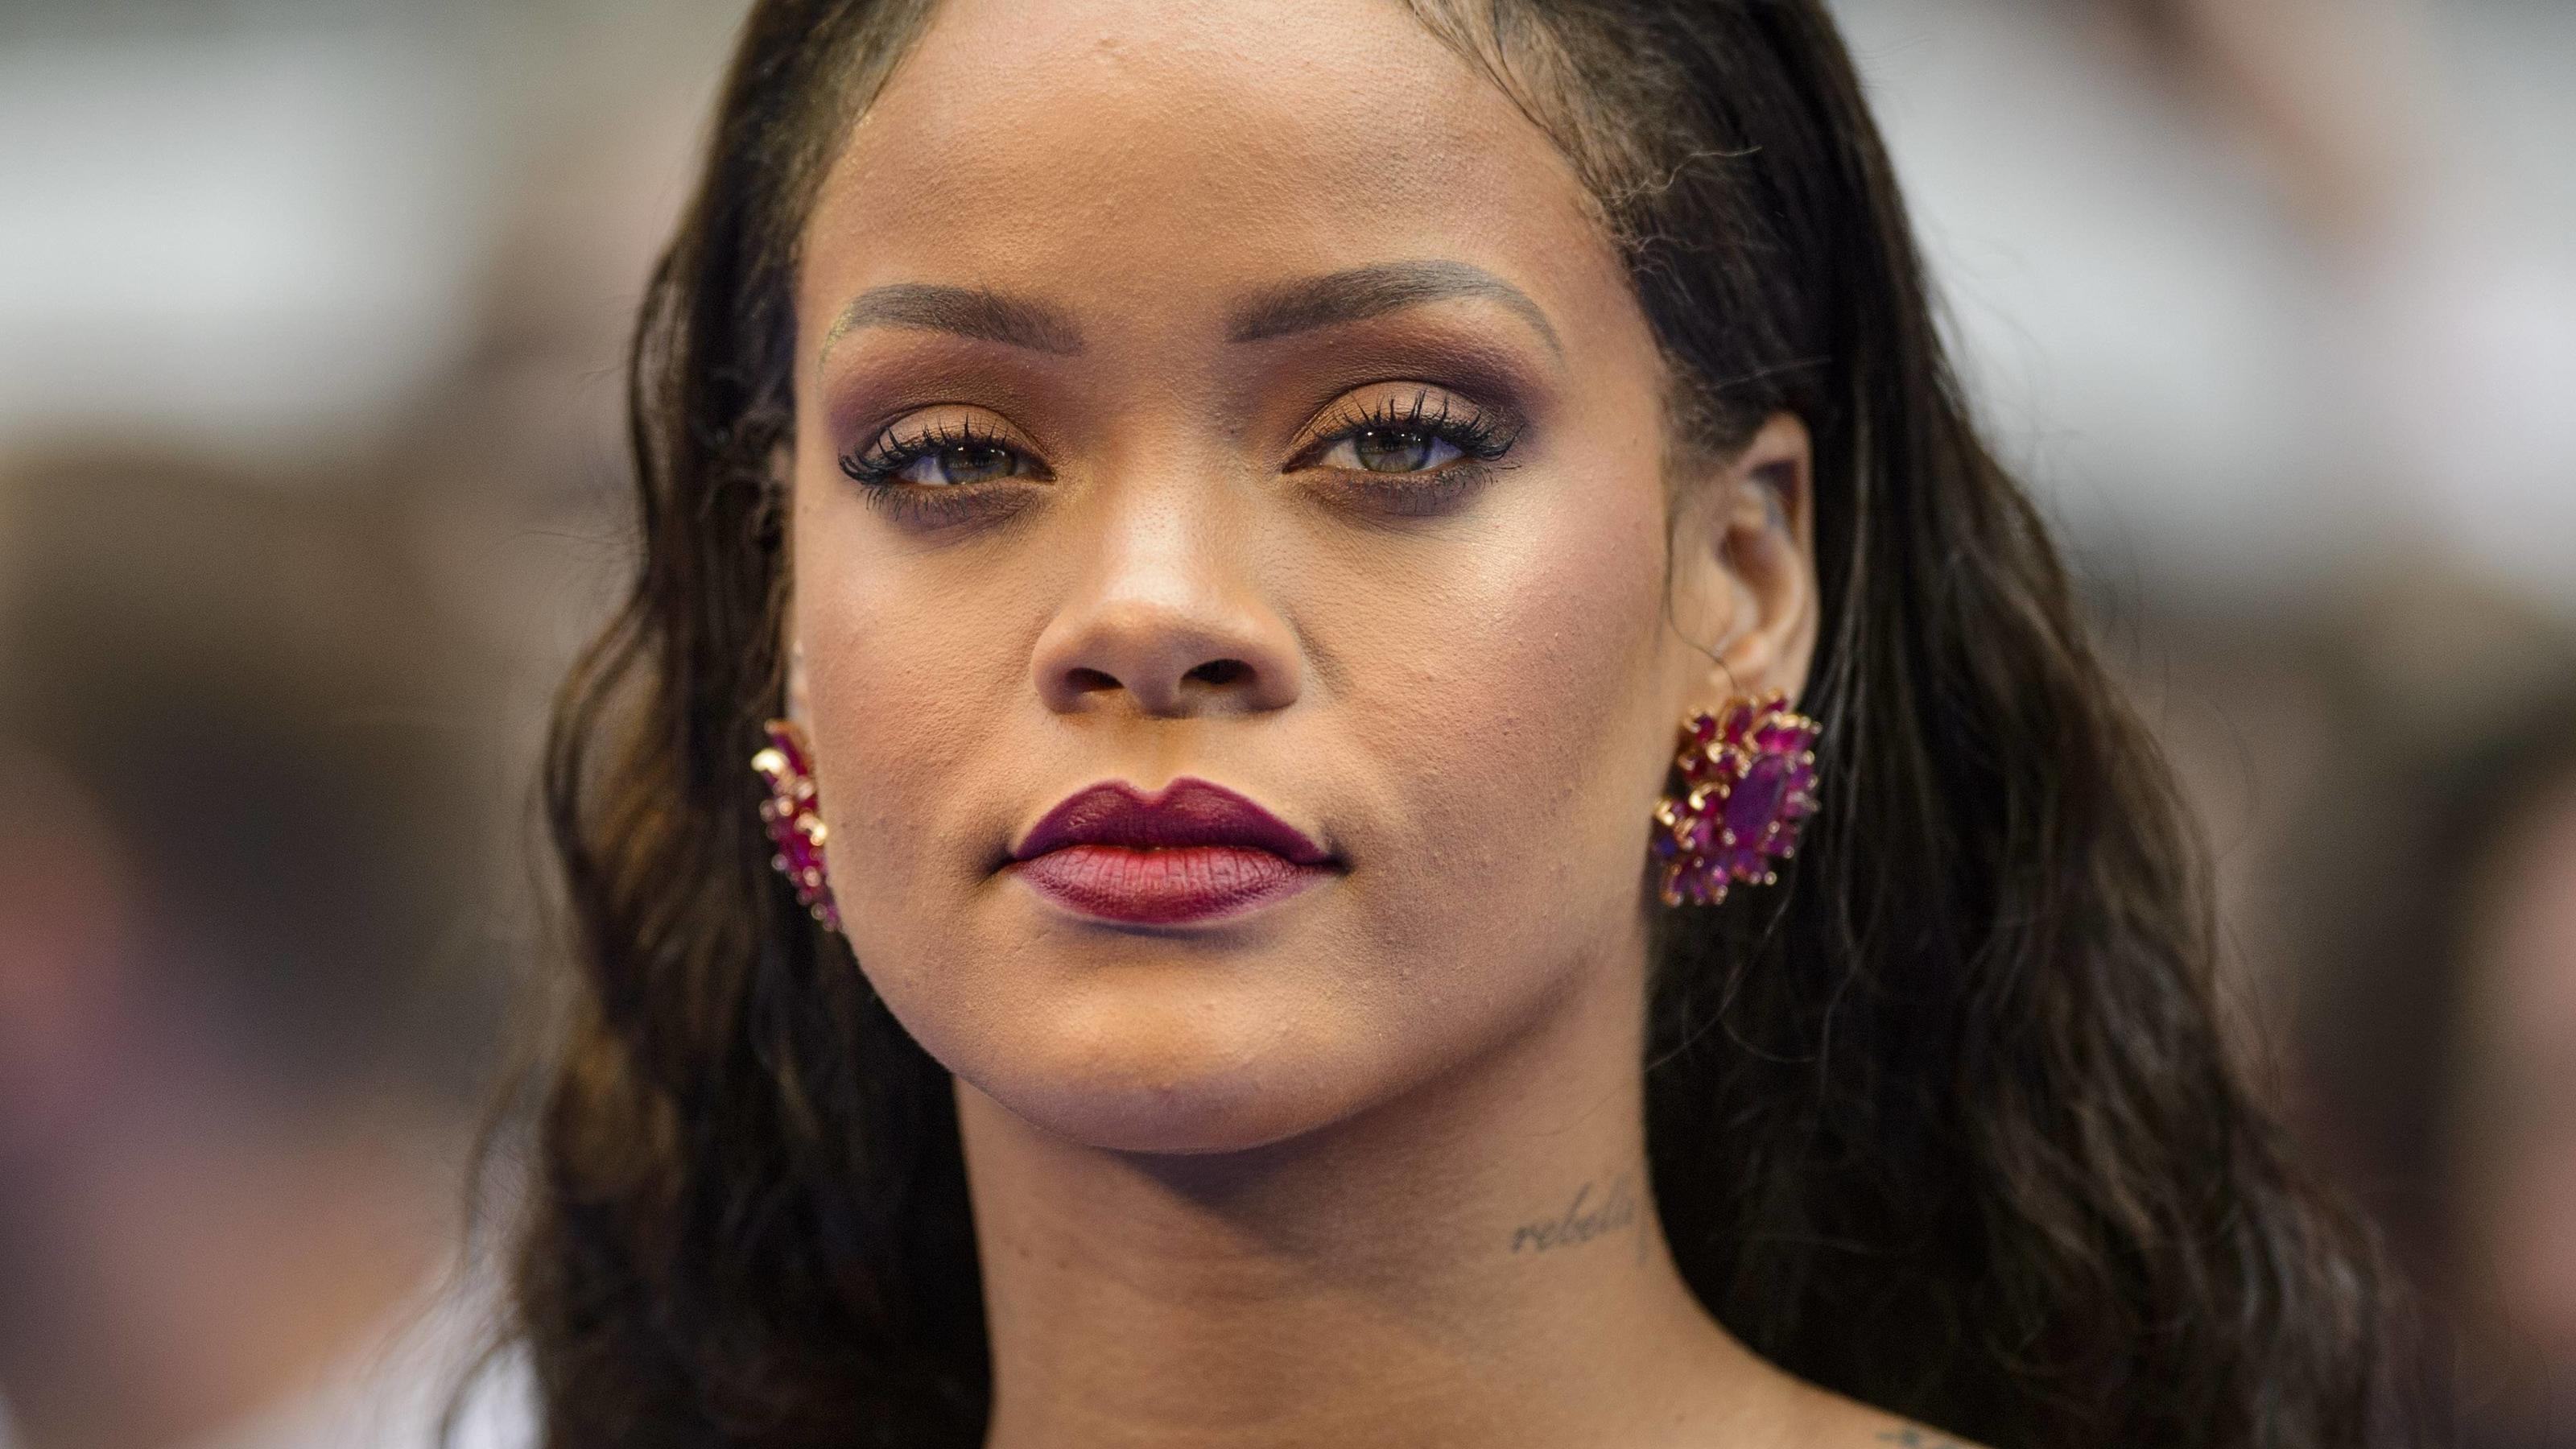 Darum Erteilt Rihanna Dem Super Bowl 2019 Eine Abfuhr inside Rihanna Super Bowl 2019